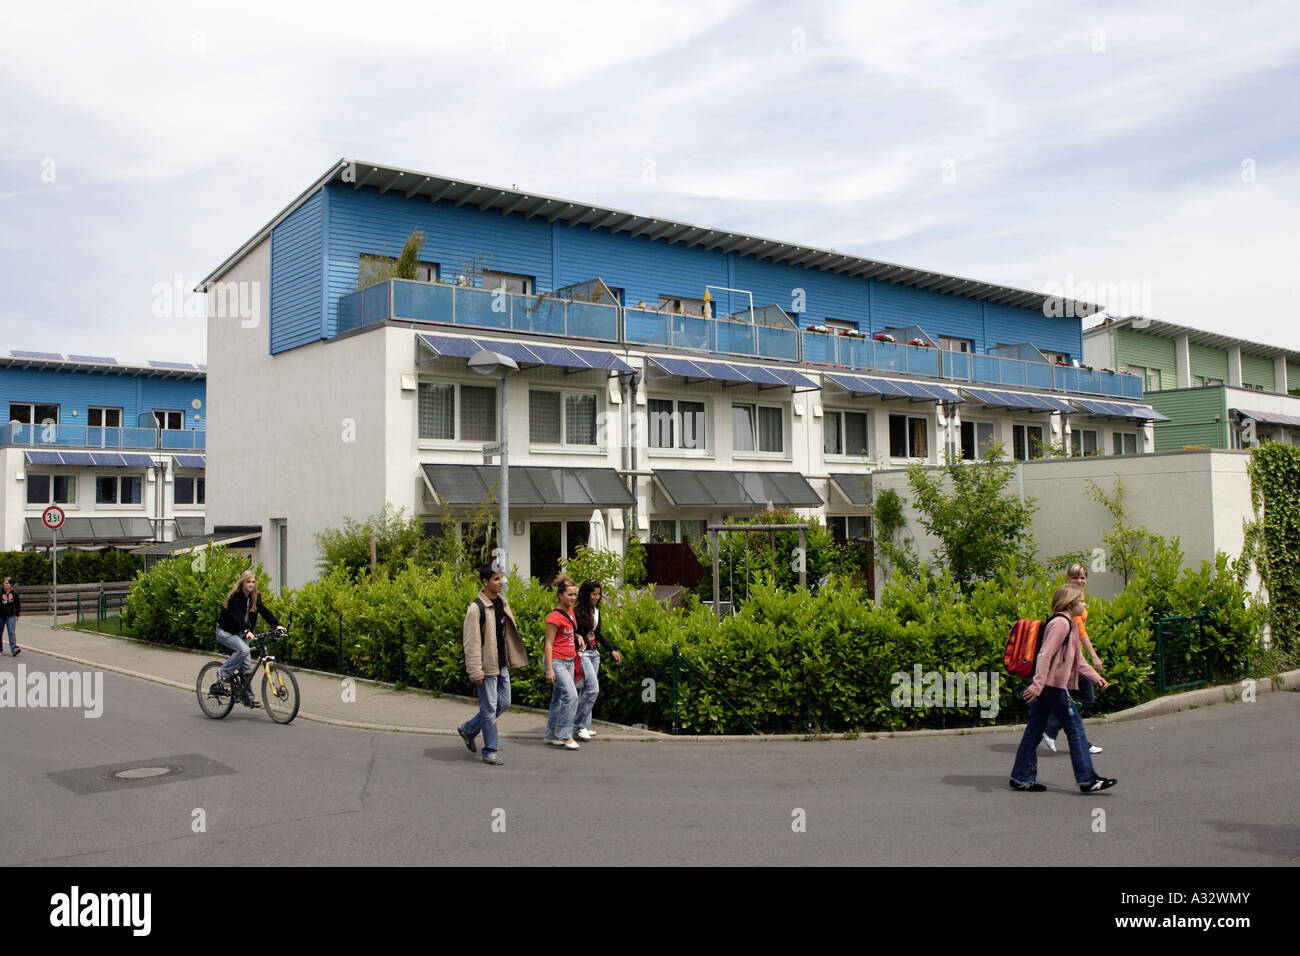 The solar community in Gelsenkirchen, Germany Stock Photo